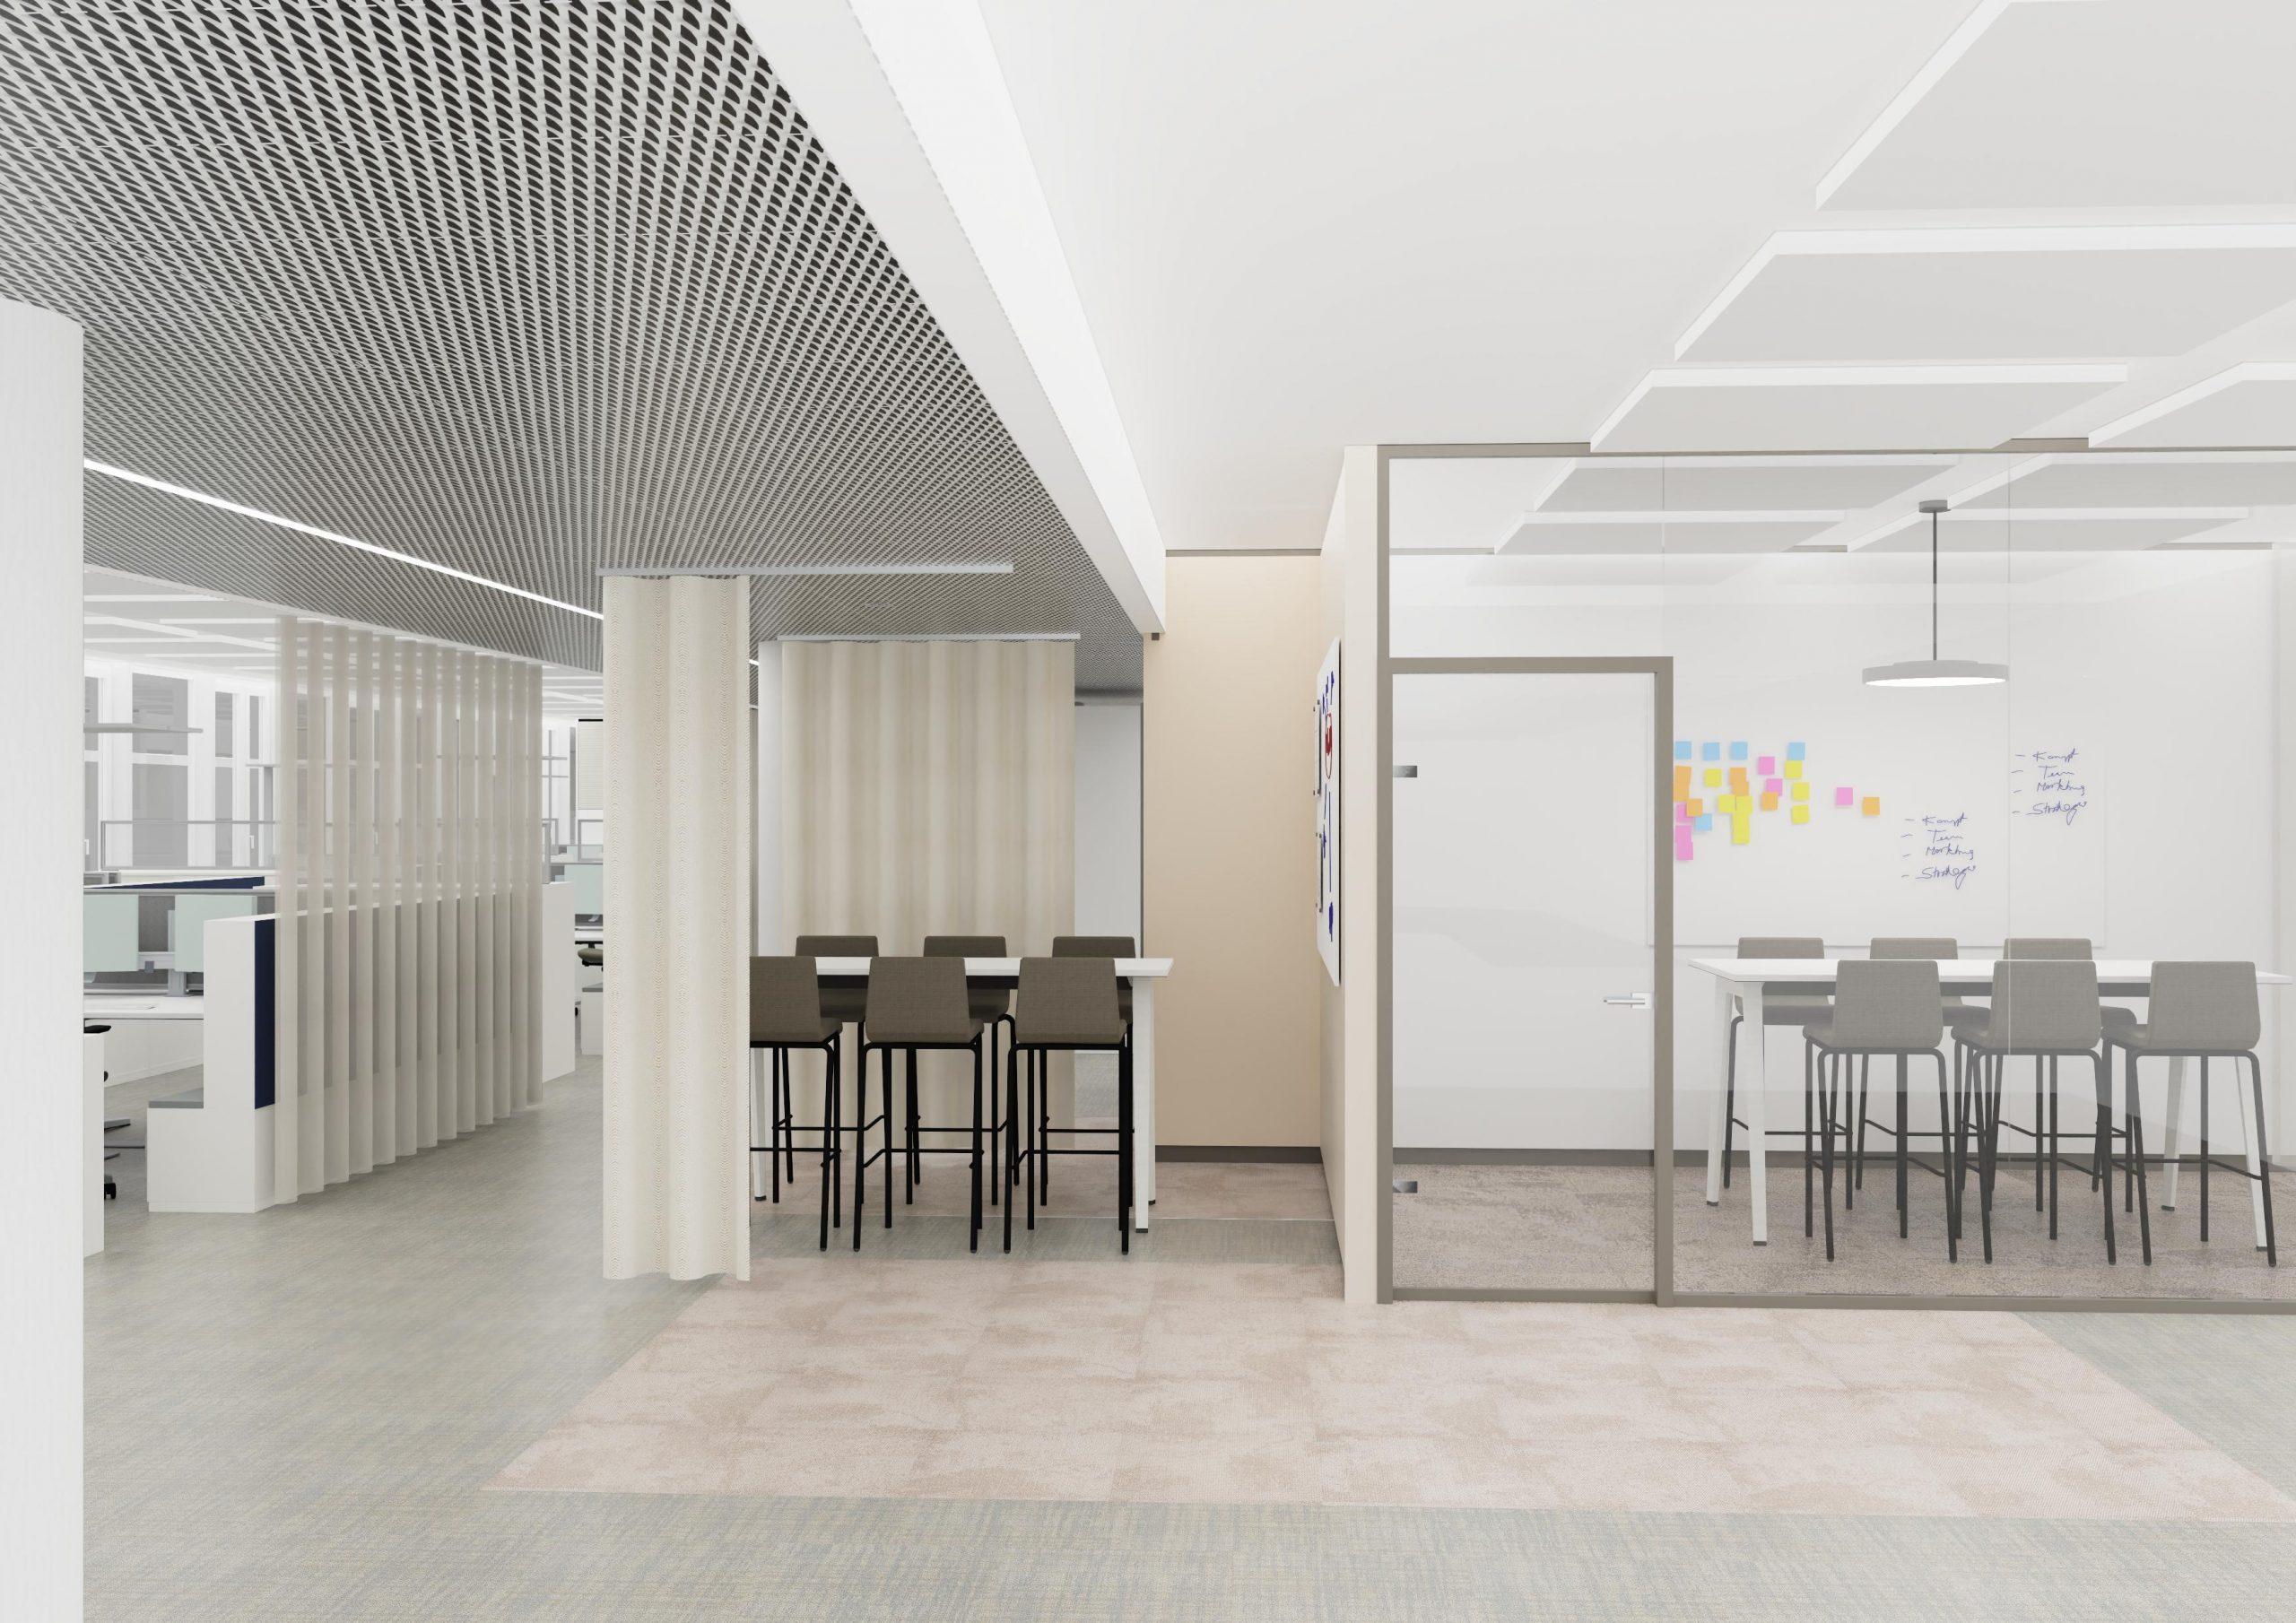 Aktuelle Projekte | Büroeinrichtung - Büroplanung - Innenausbau | WSA